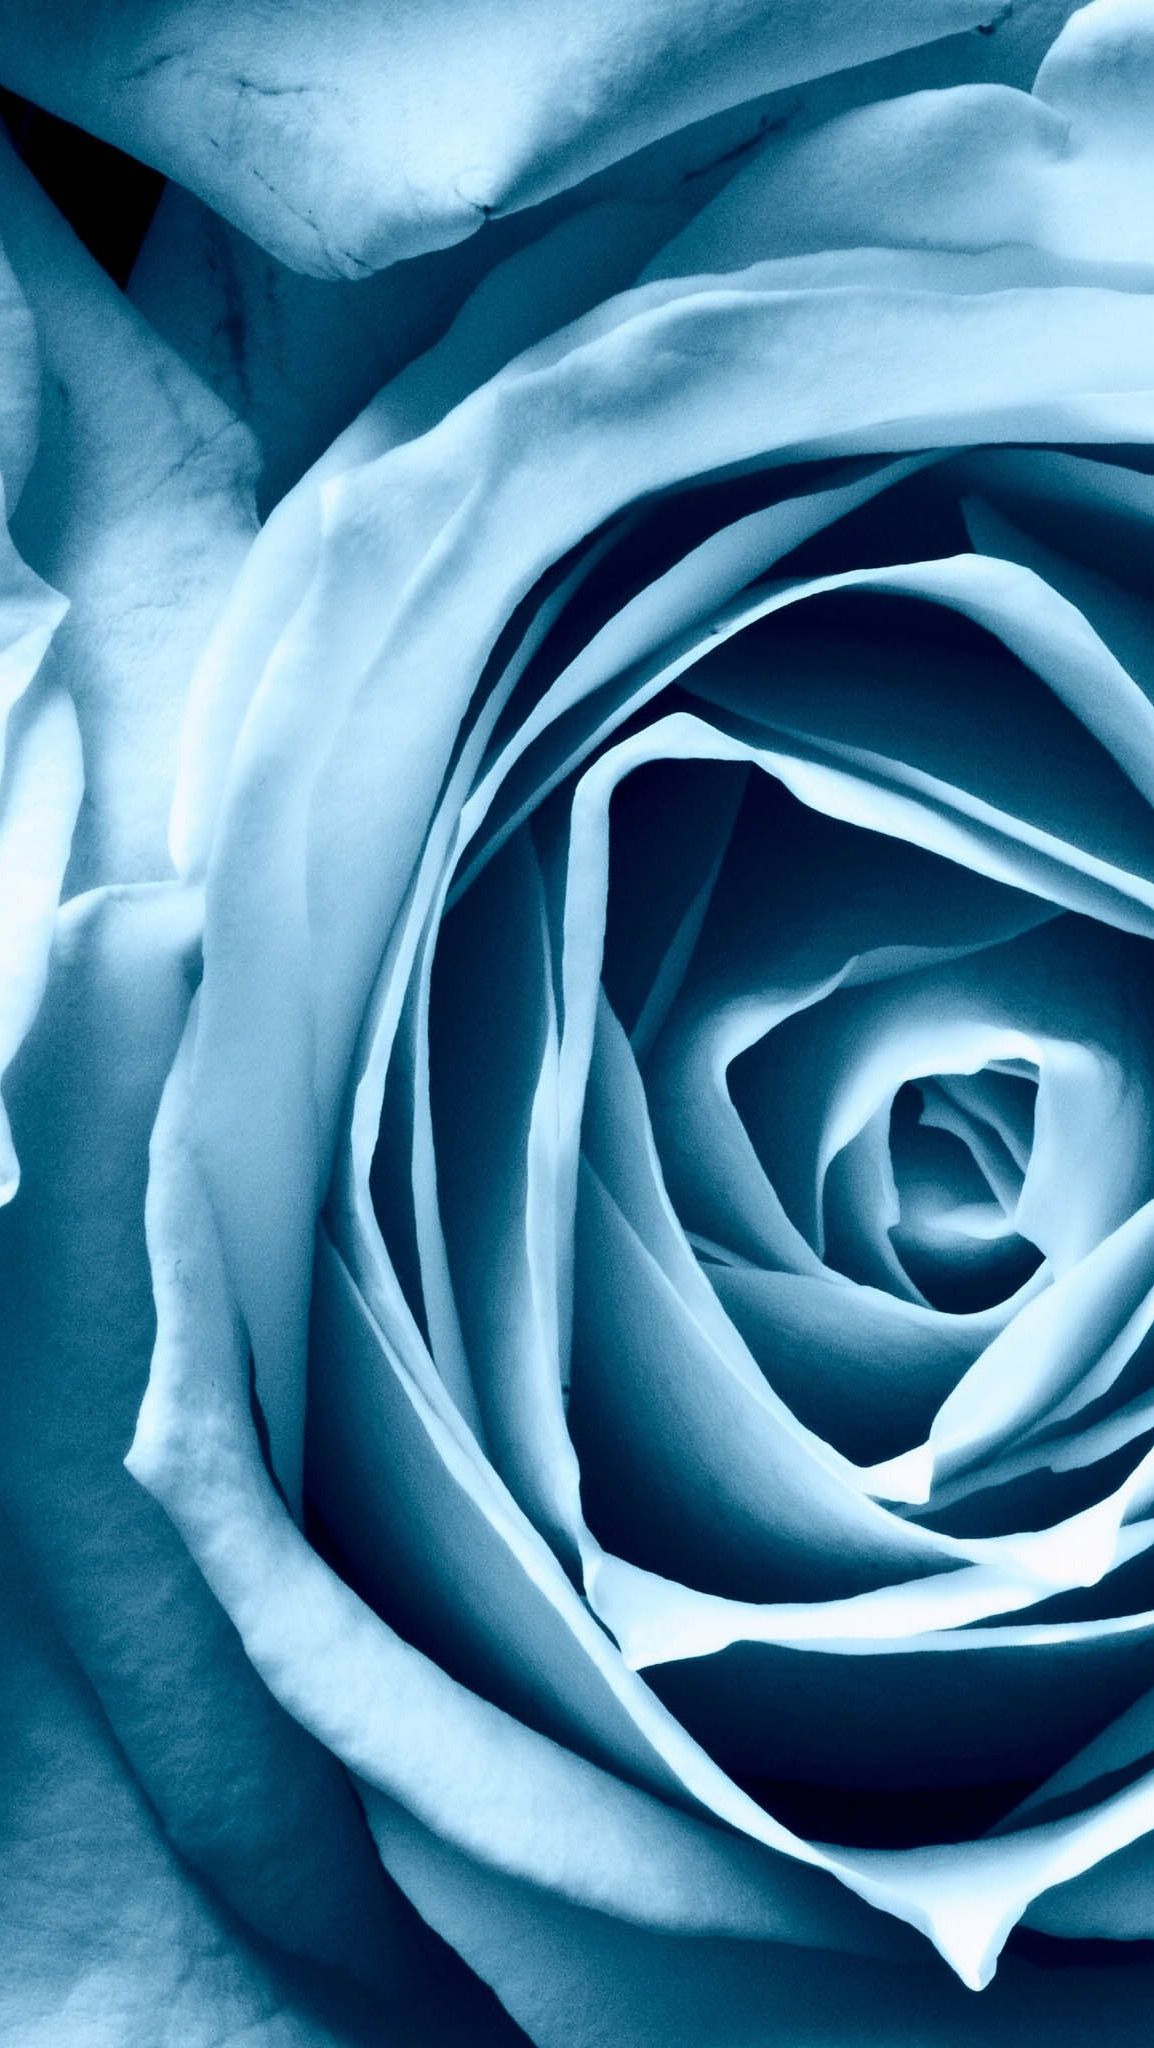 Pin by Glediola Alija on Flowers Baby blue iphone